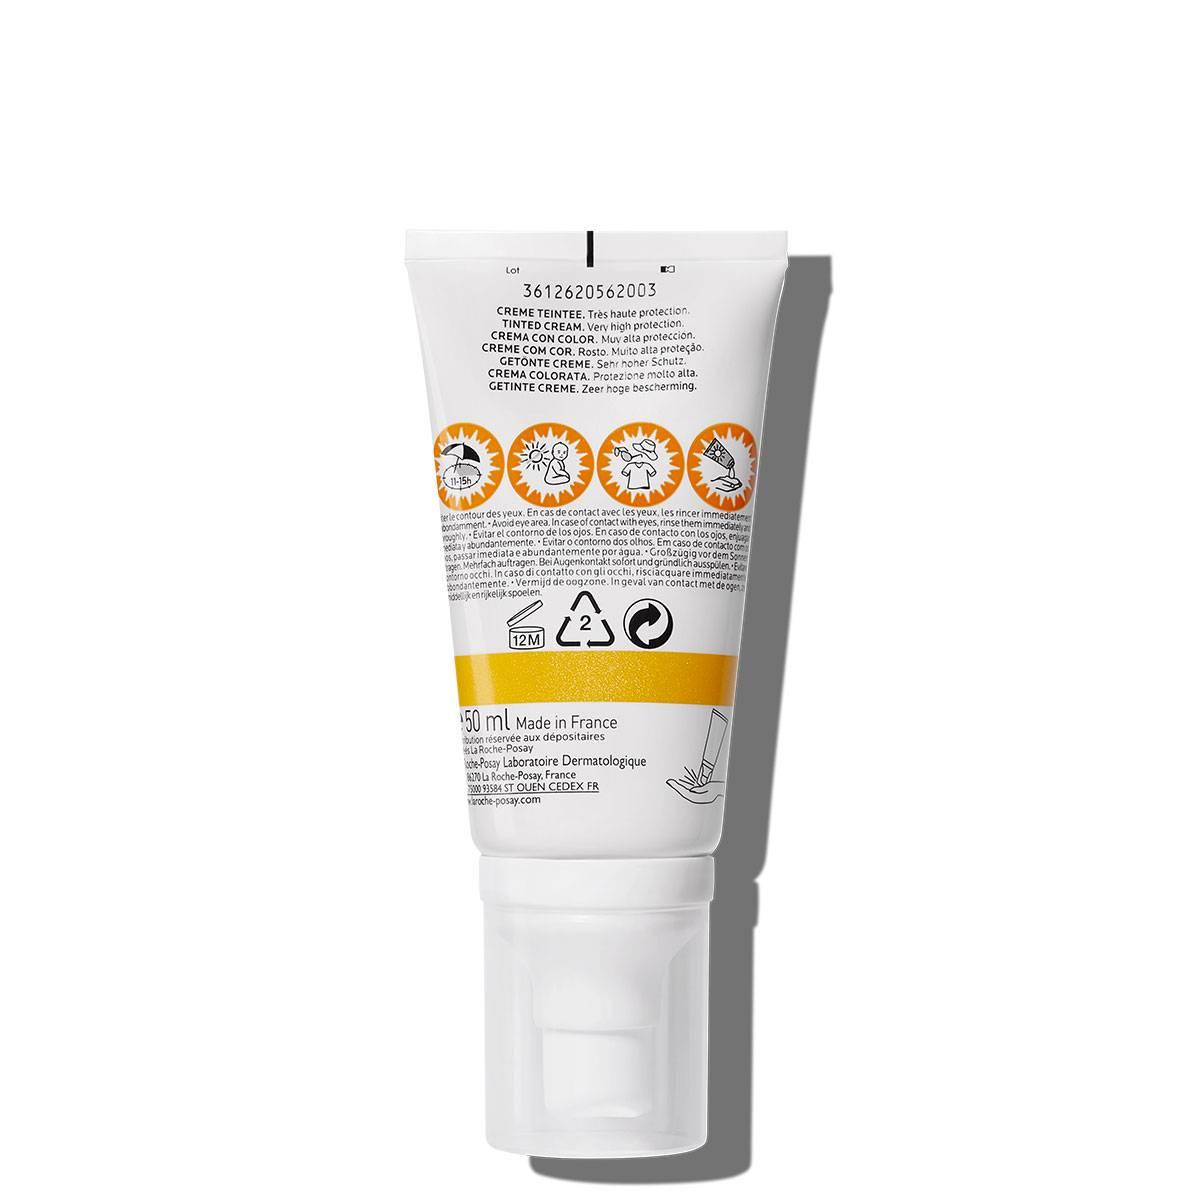 La Roche Posay ProductPage Sun Anthelios Pigmentation Tinted Cream Spf